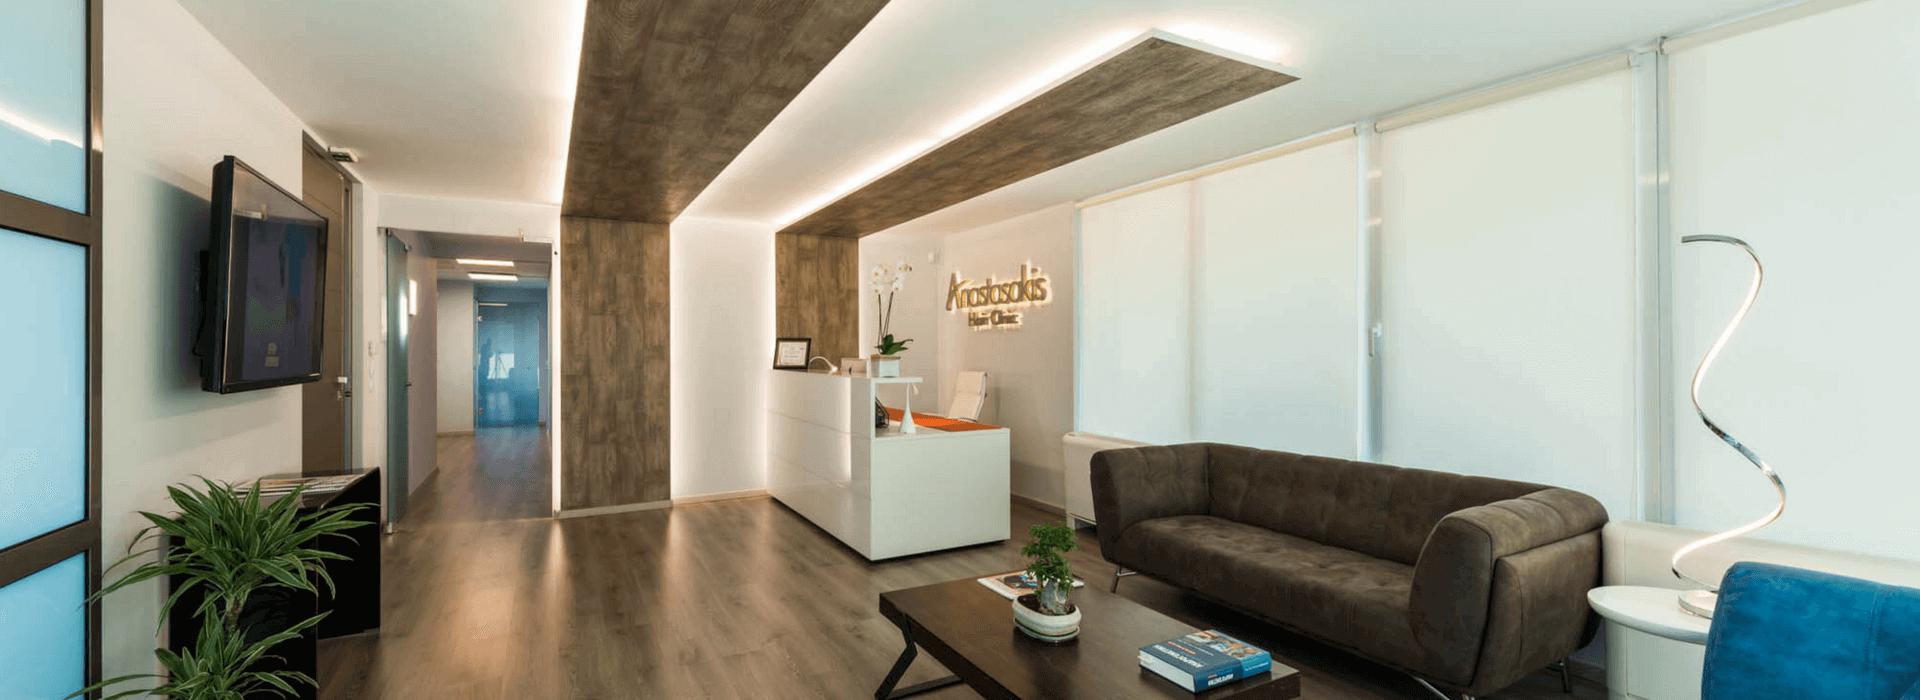 anastasakis-hair-clinic